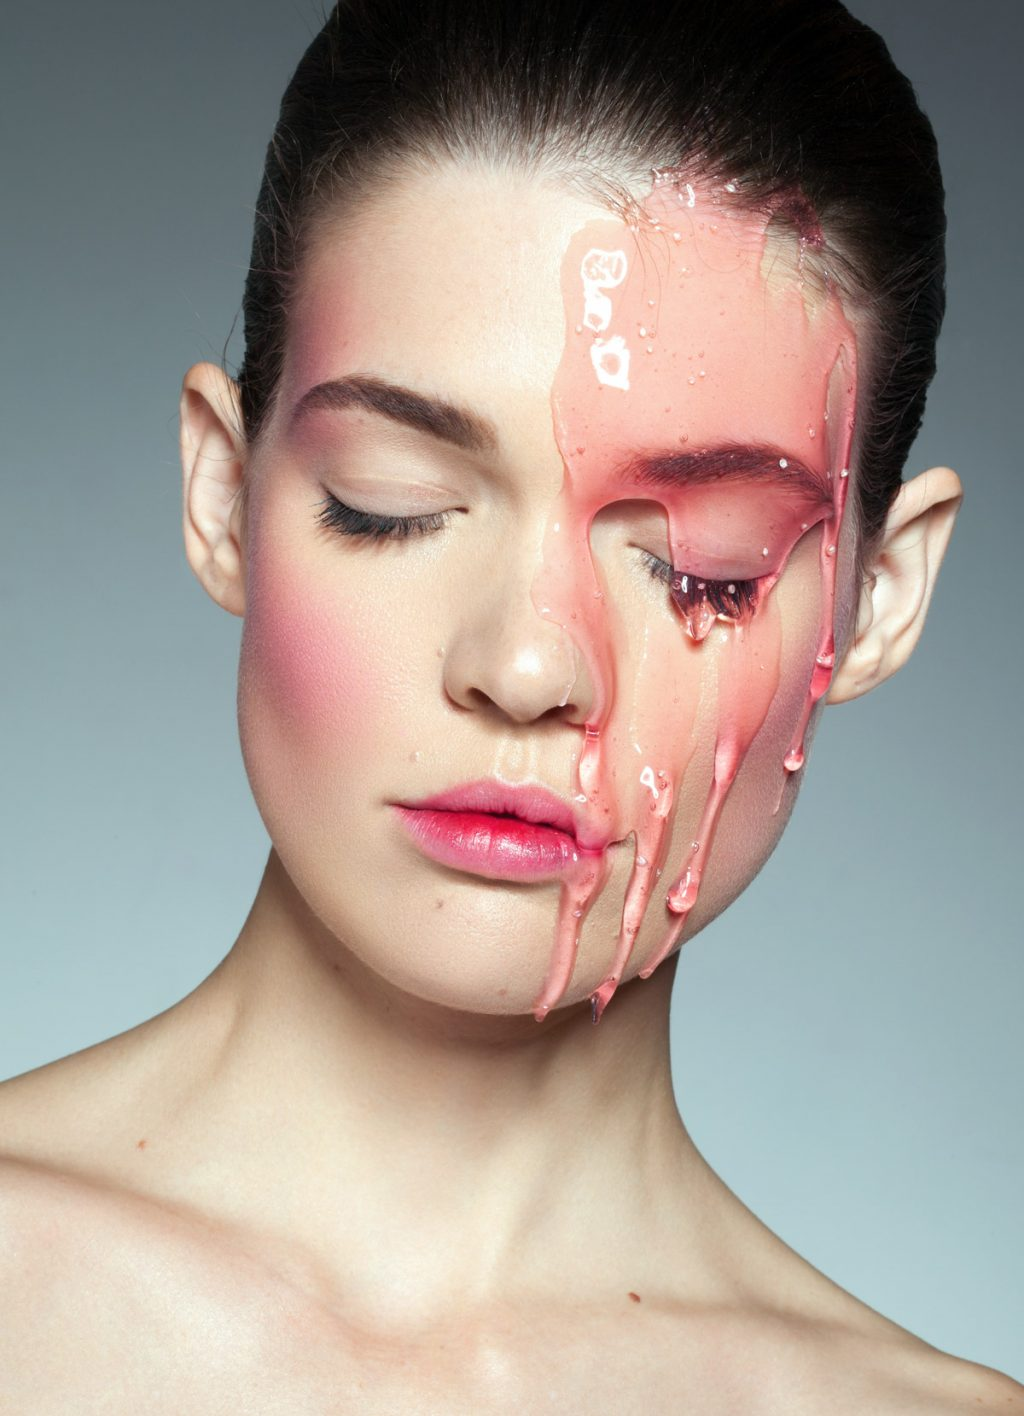 Makeup by Elizabeth Ulloa, photo & post by Julia Kuzmenko McKim